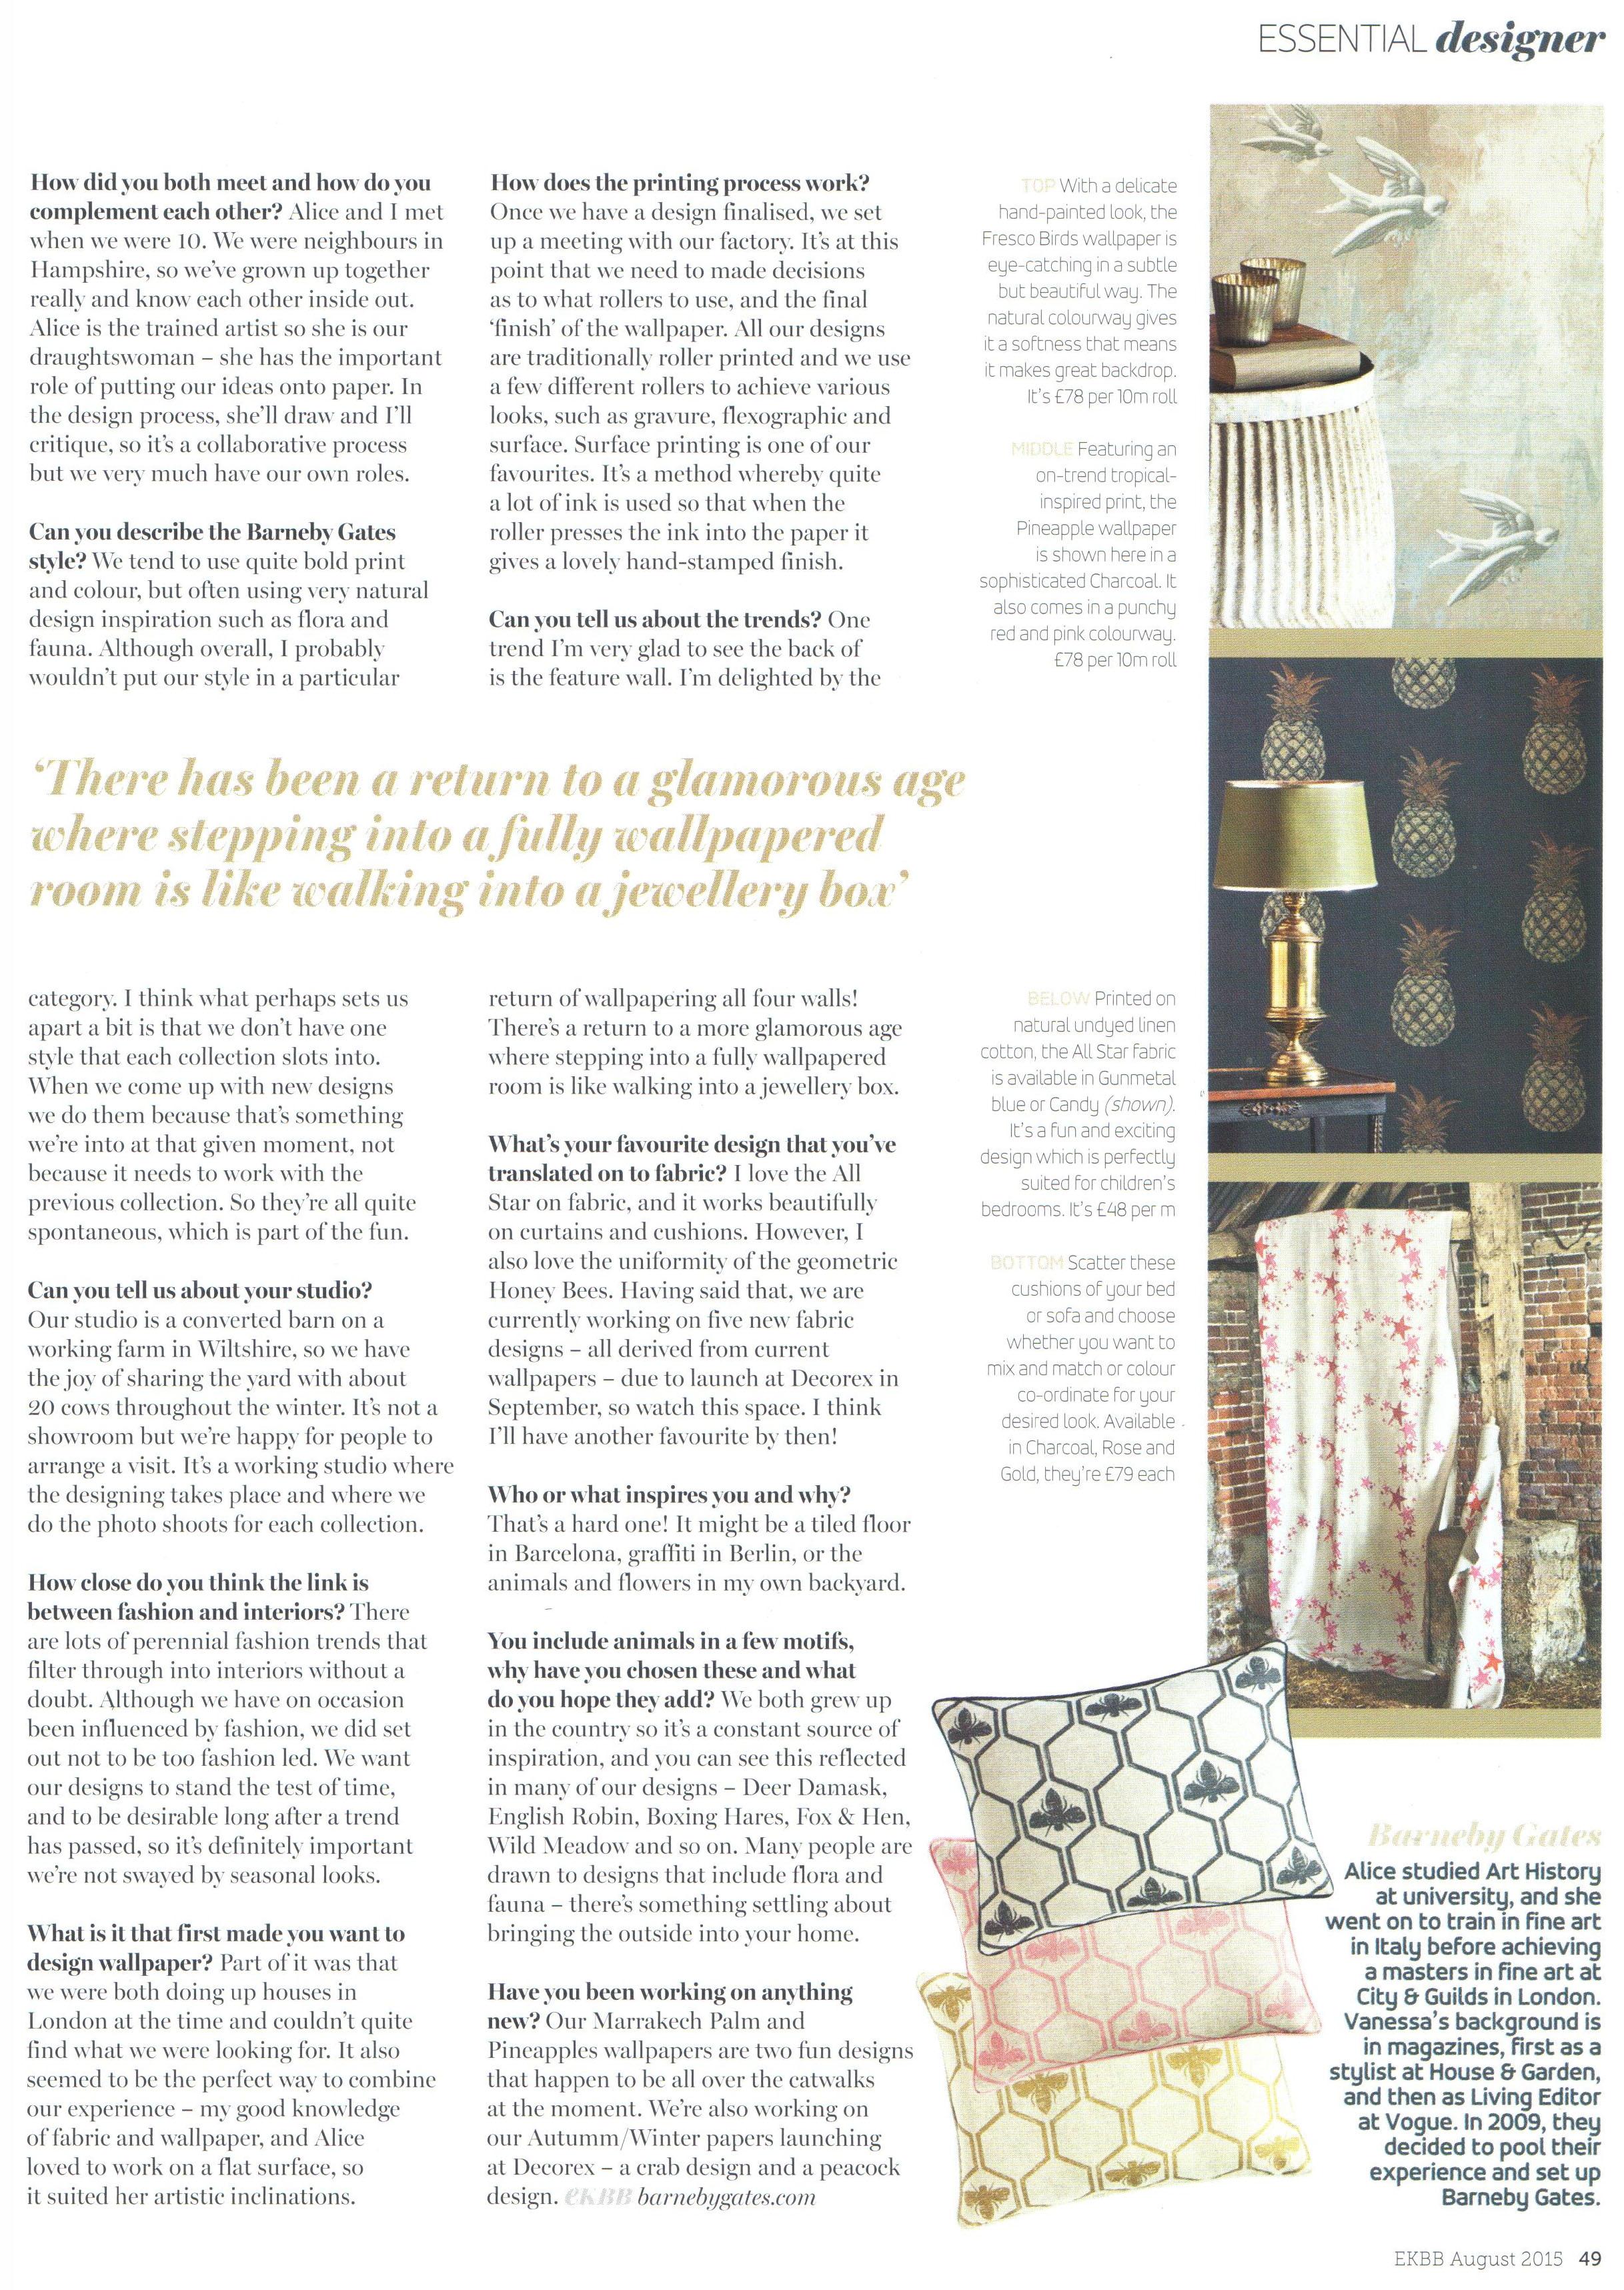 Essential Kitchen, Bathroom, Bedroom - Article 2 - Aug 2015